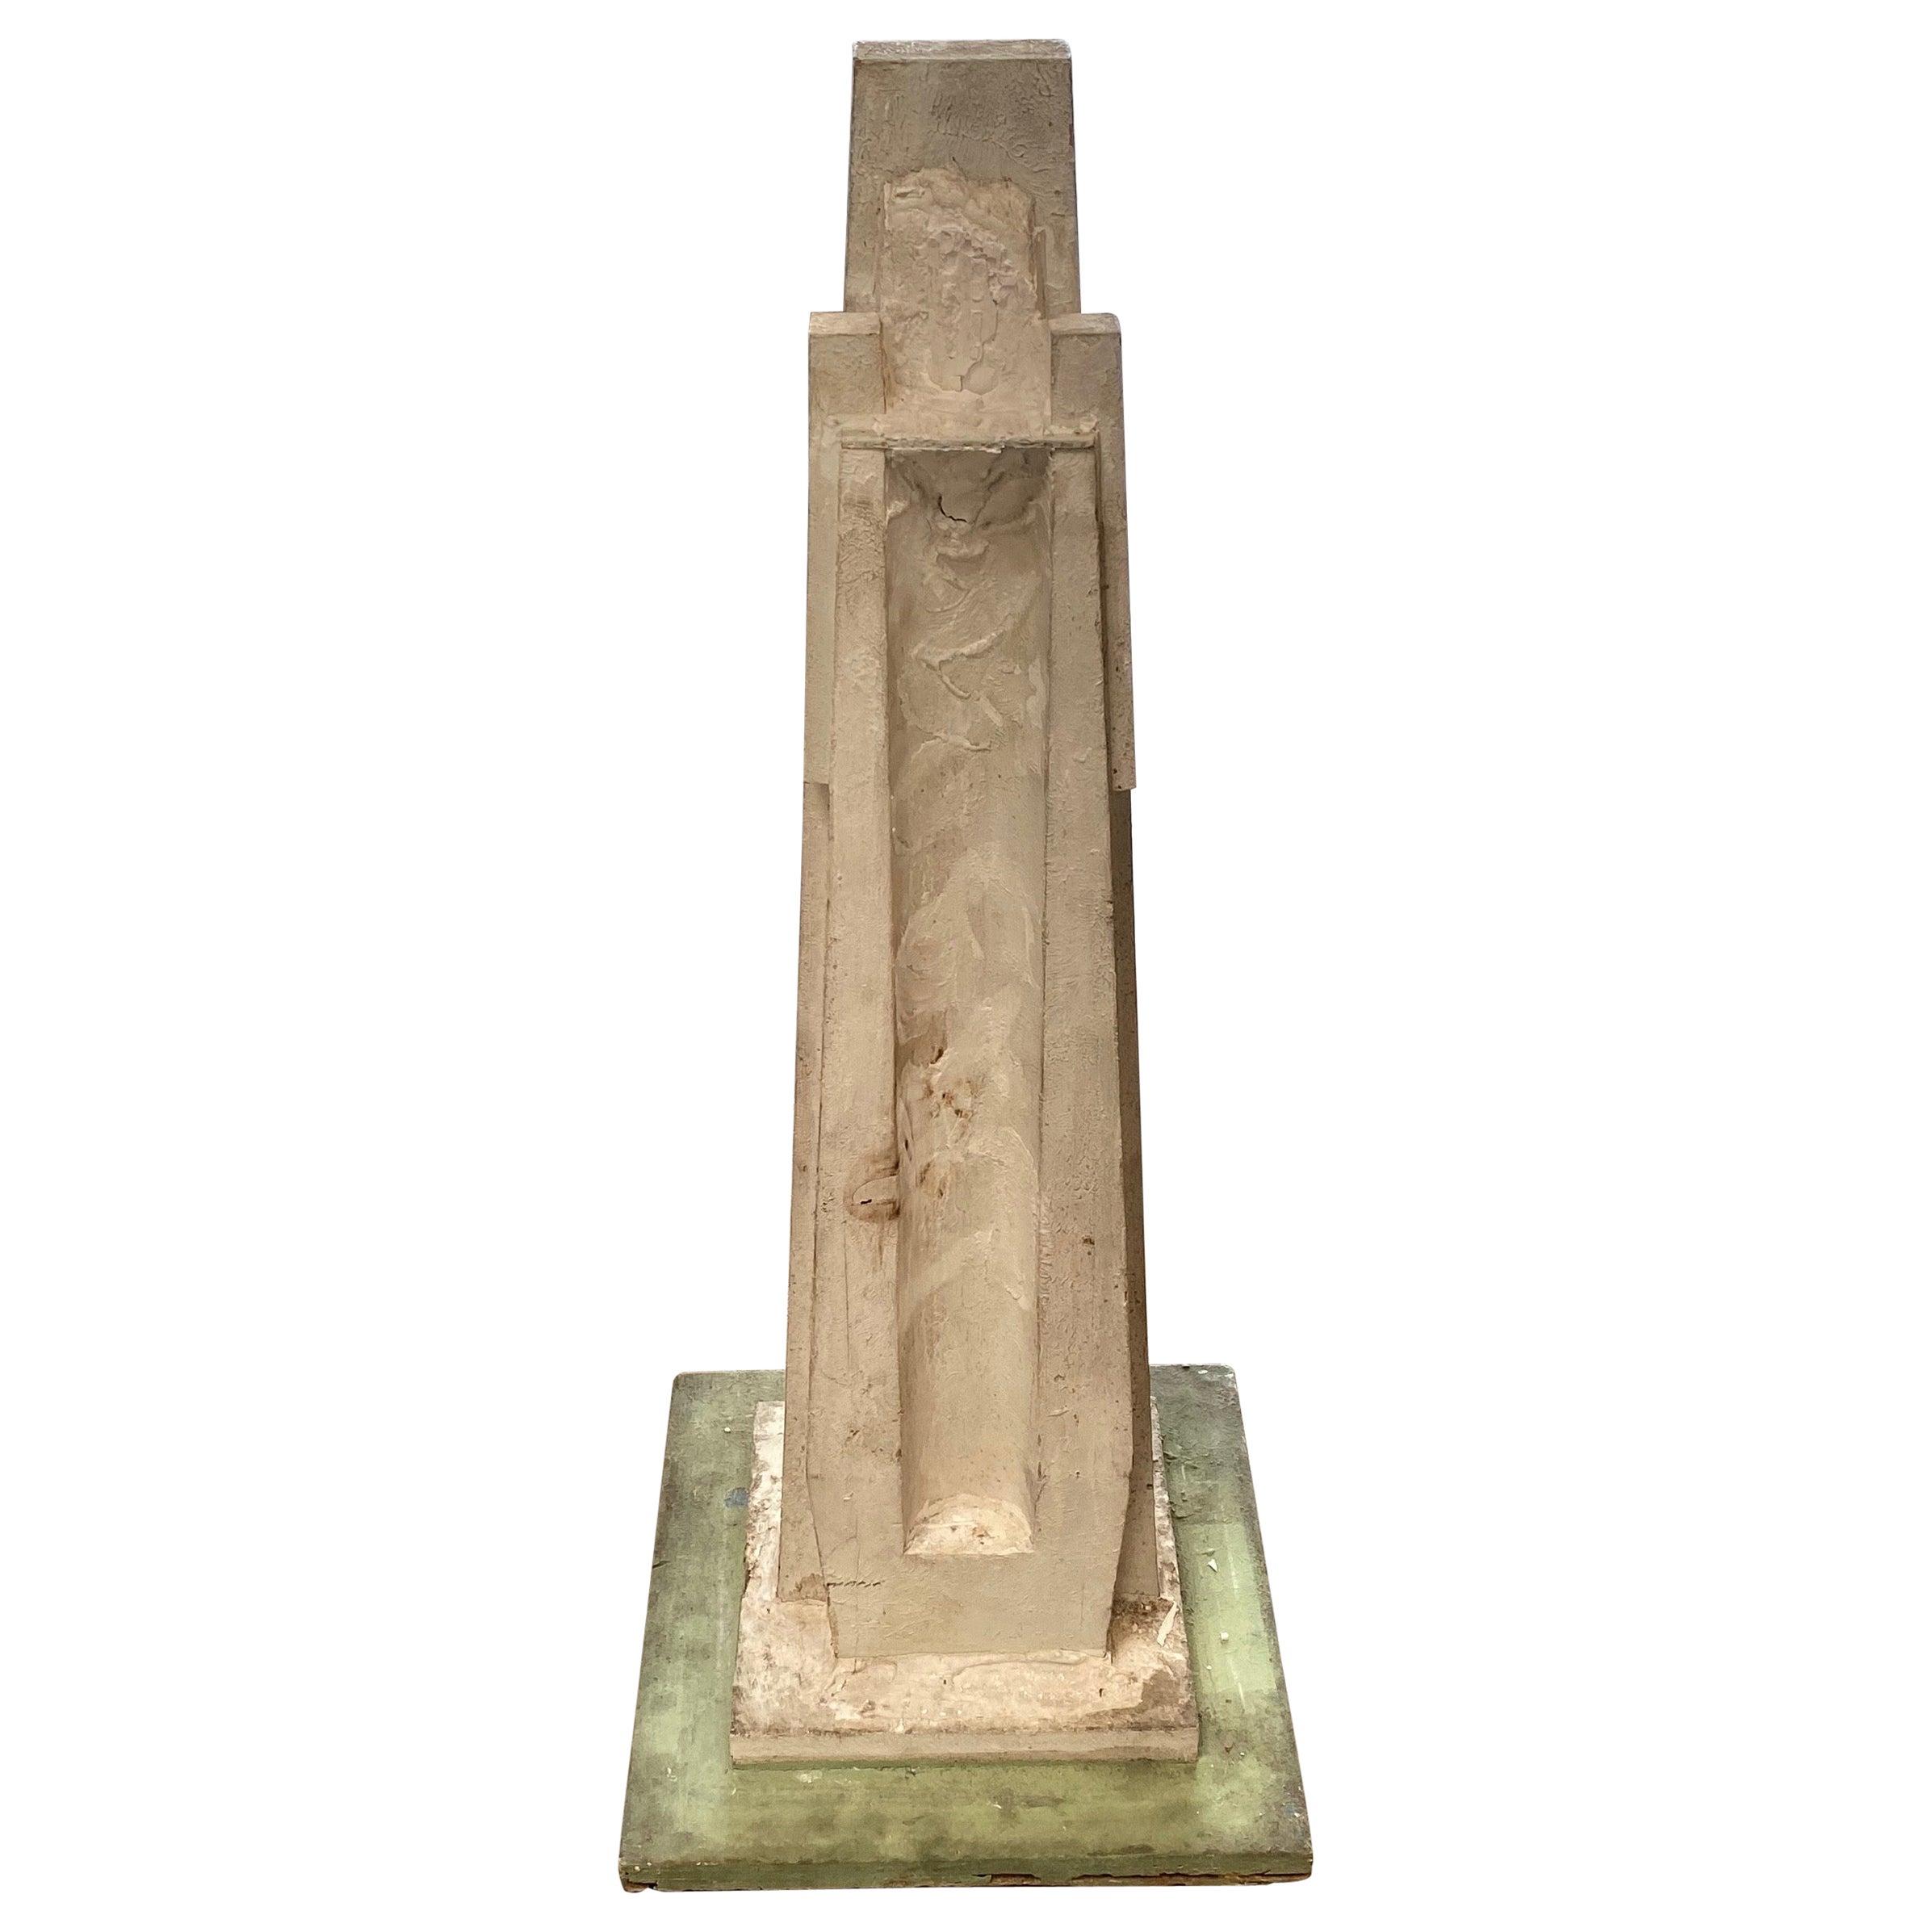 Monumental Vintage Statuary Obelisk, Italy, 1940s